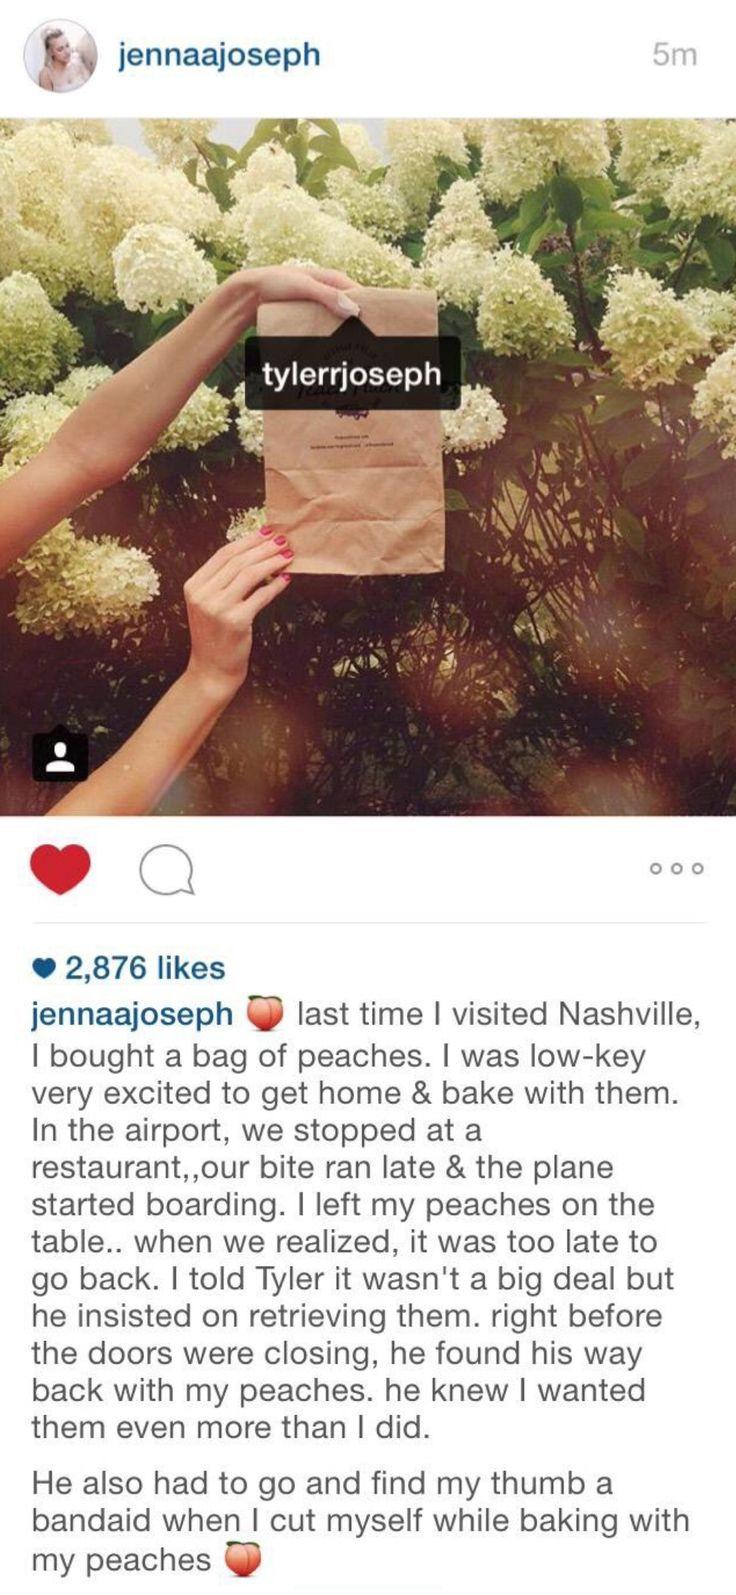 <3 tyler joseph's wife jenna's instagram ✧